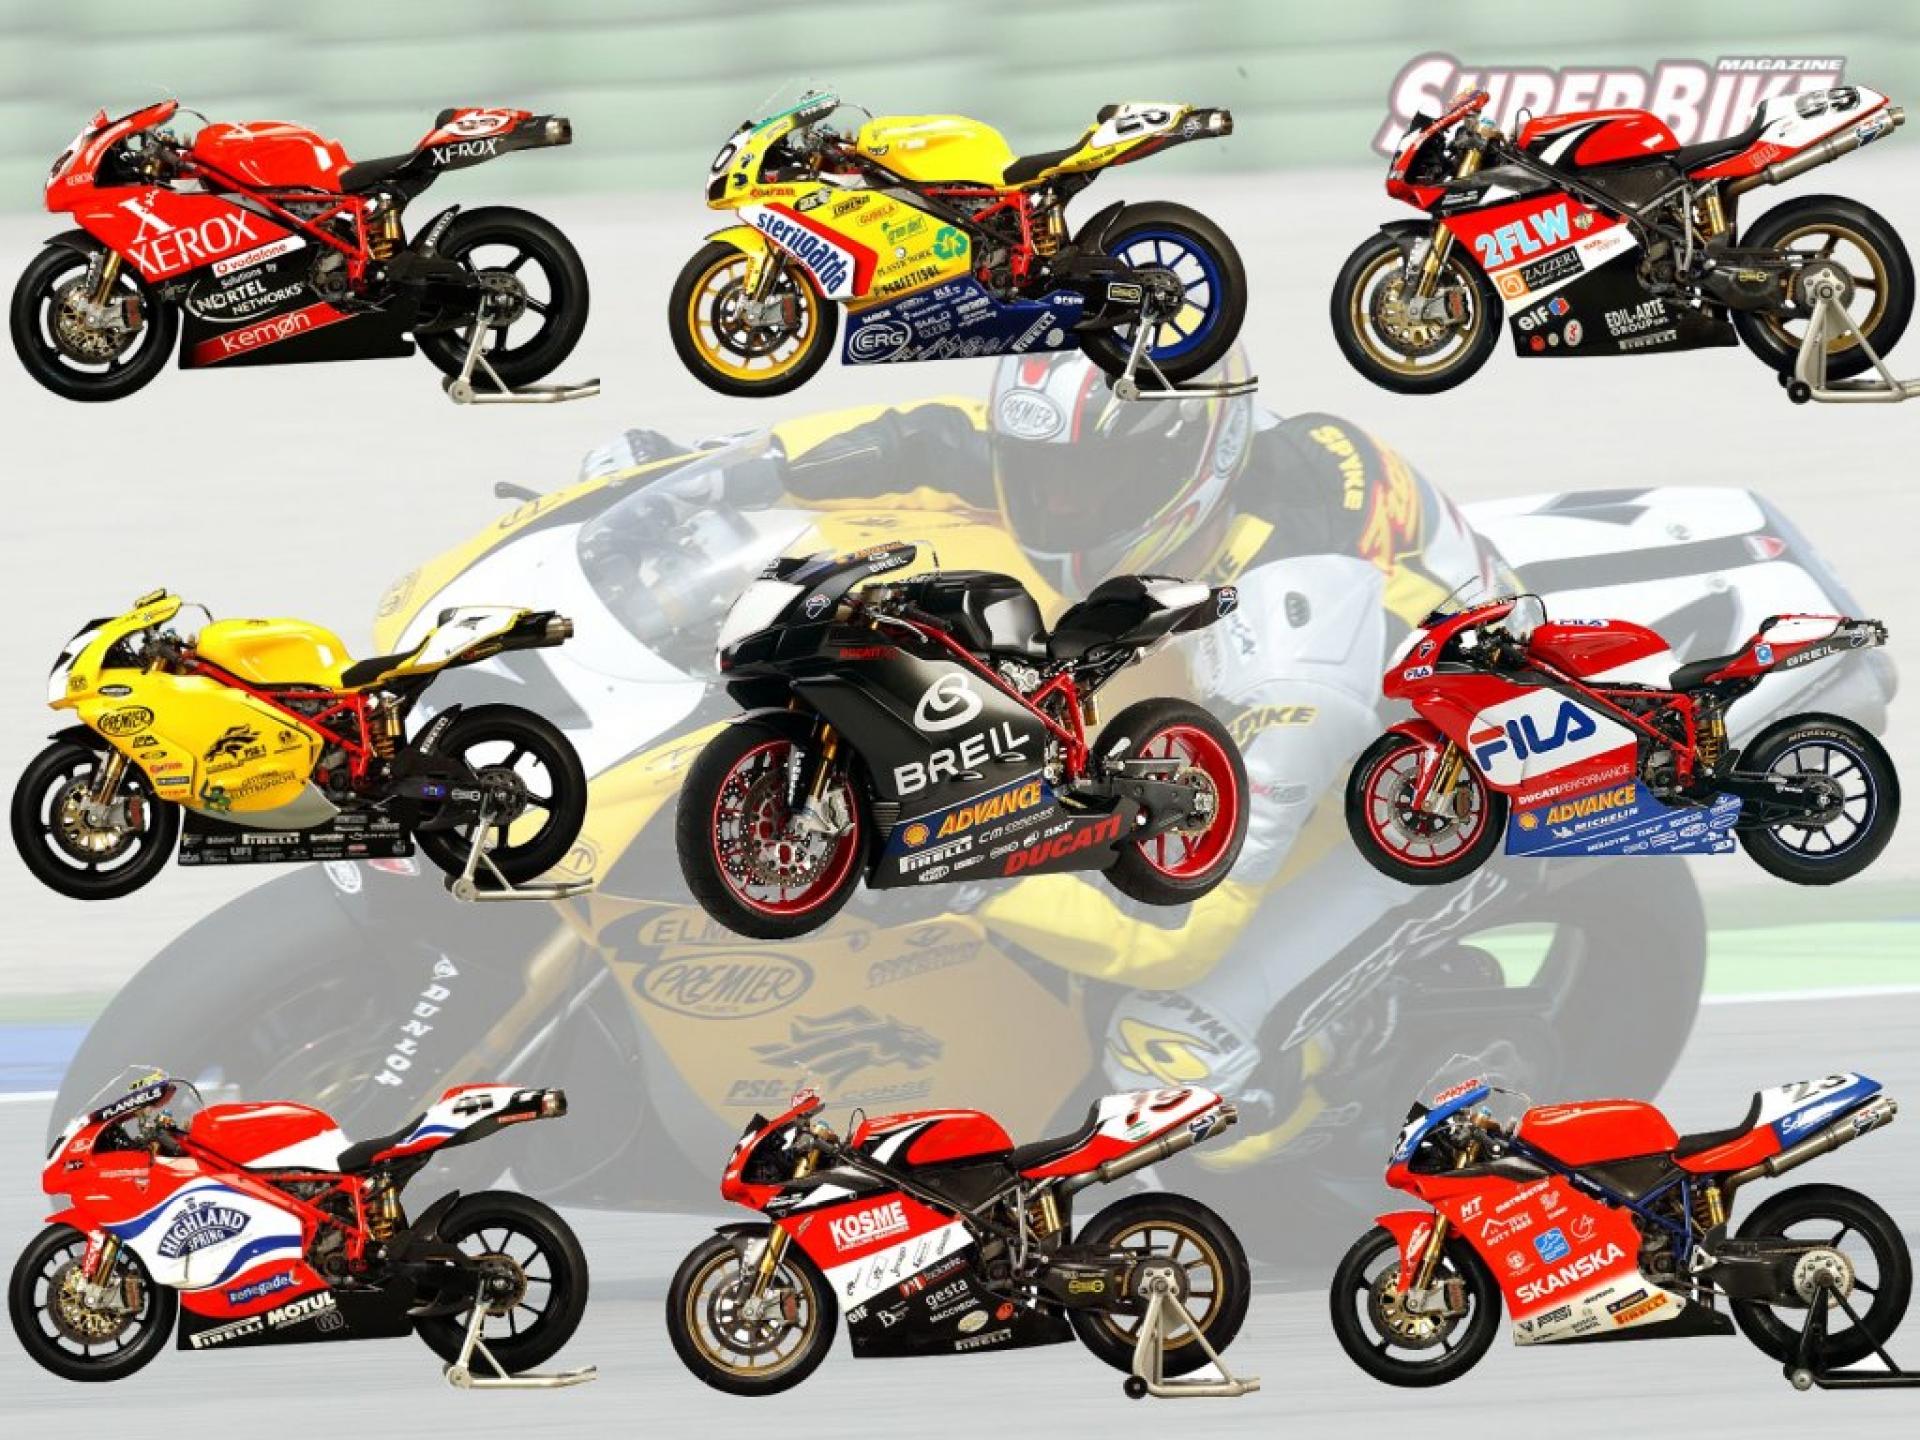 5614-ducati-race-bike-wallpaper-ducati-ms-the-ultimate-ducati-forum_1920x1080.jpg